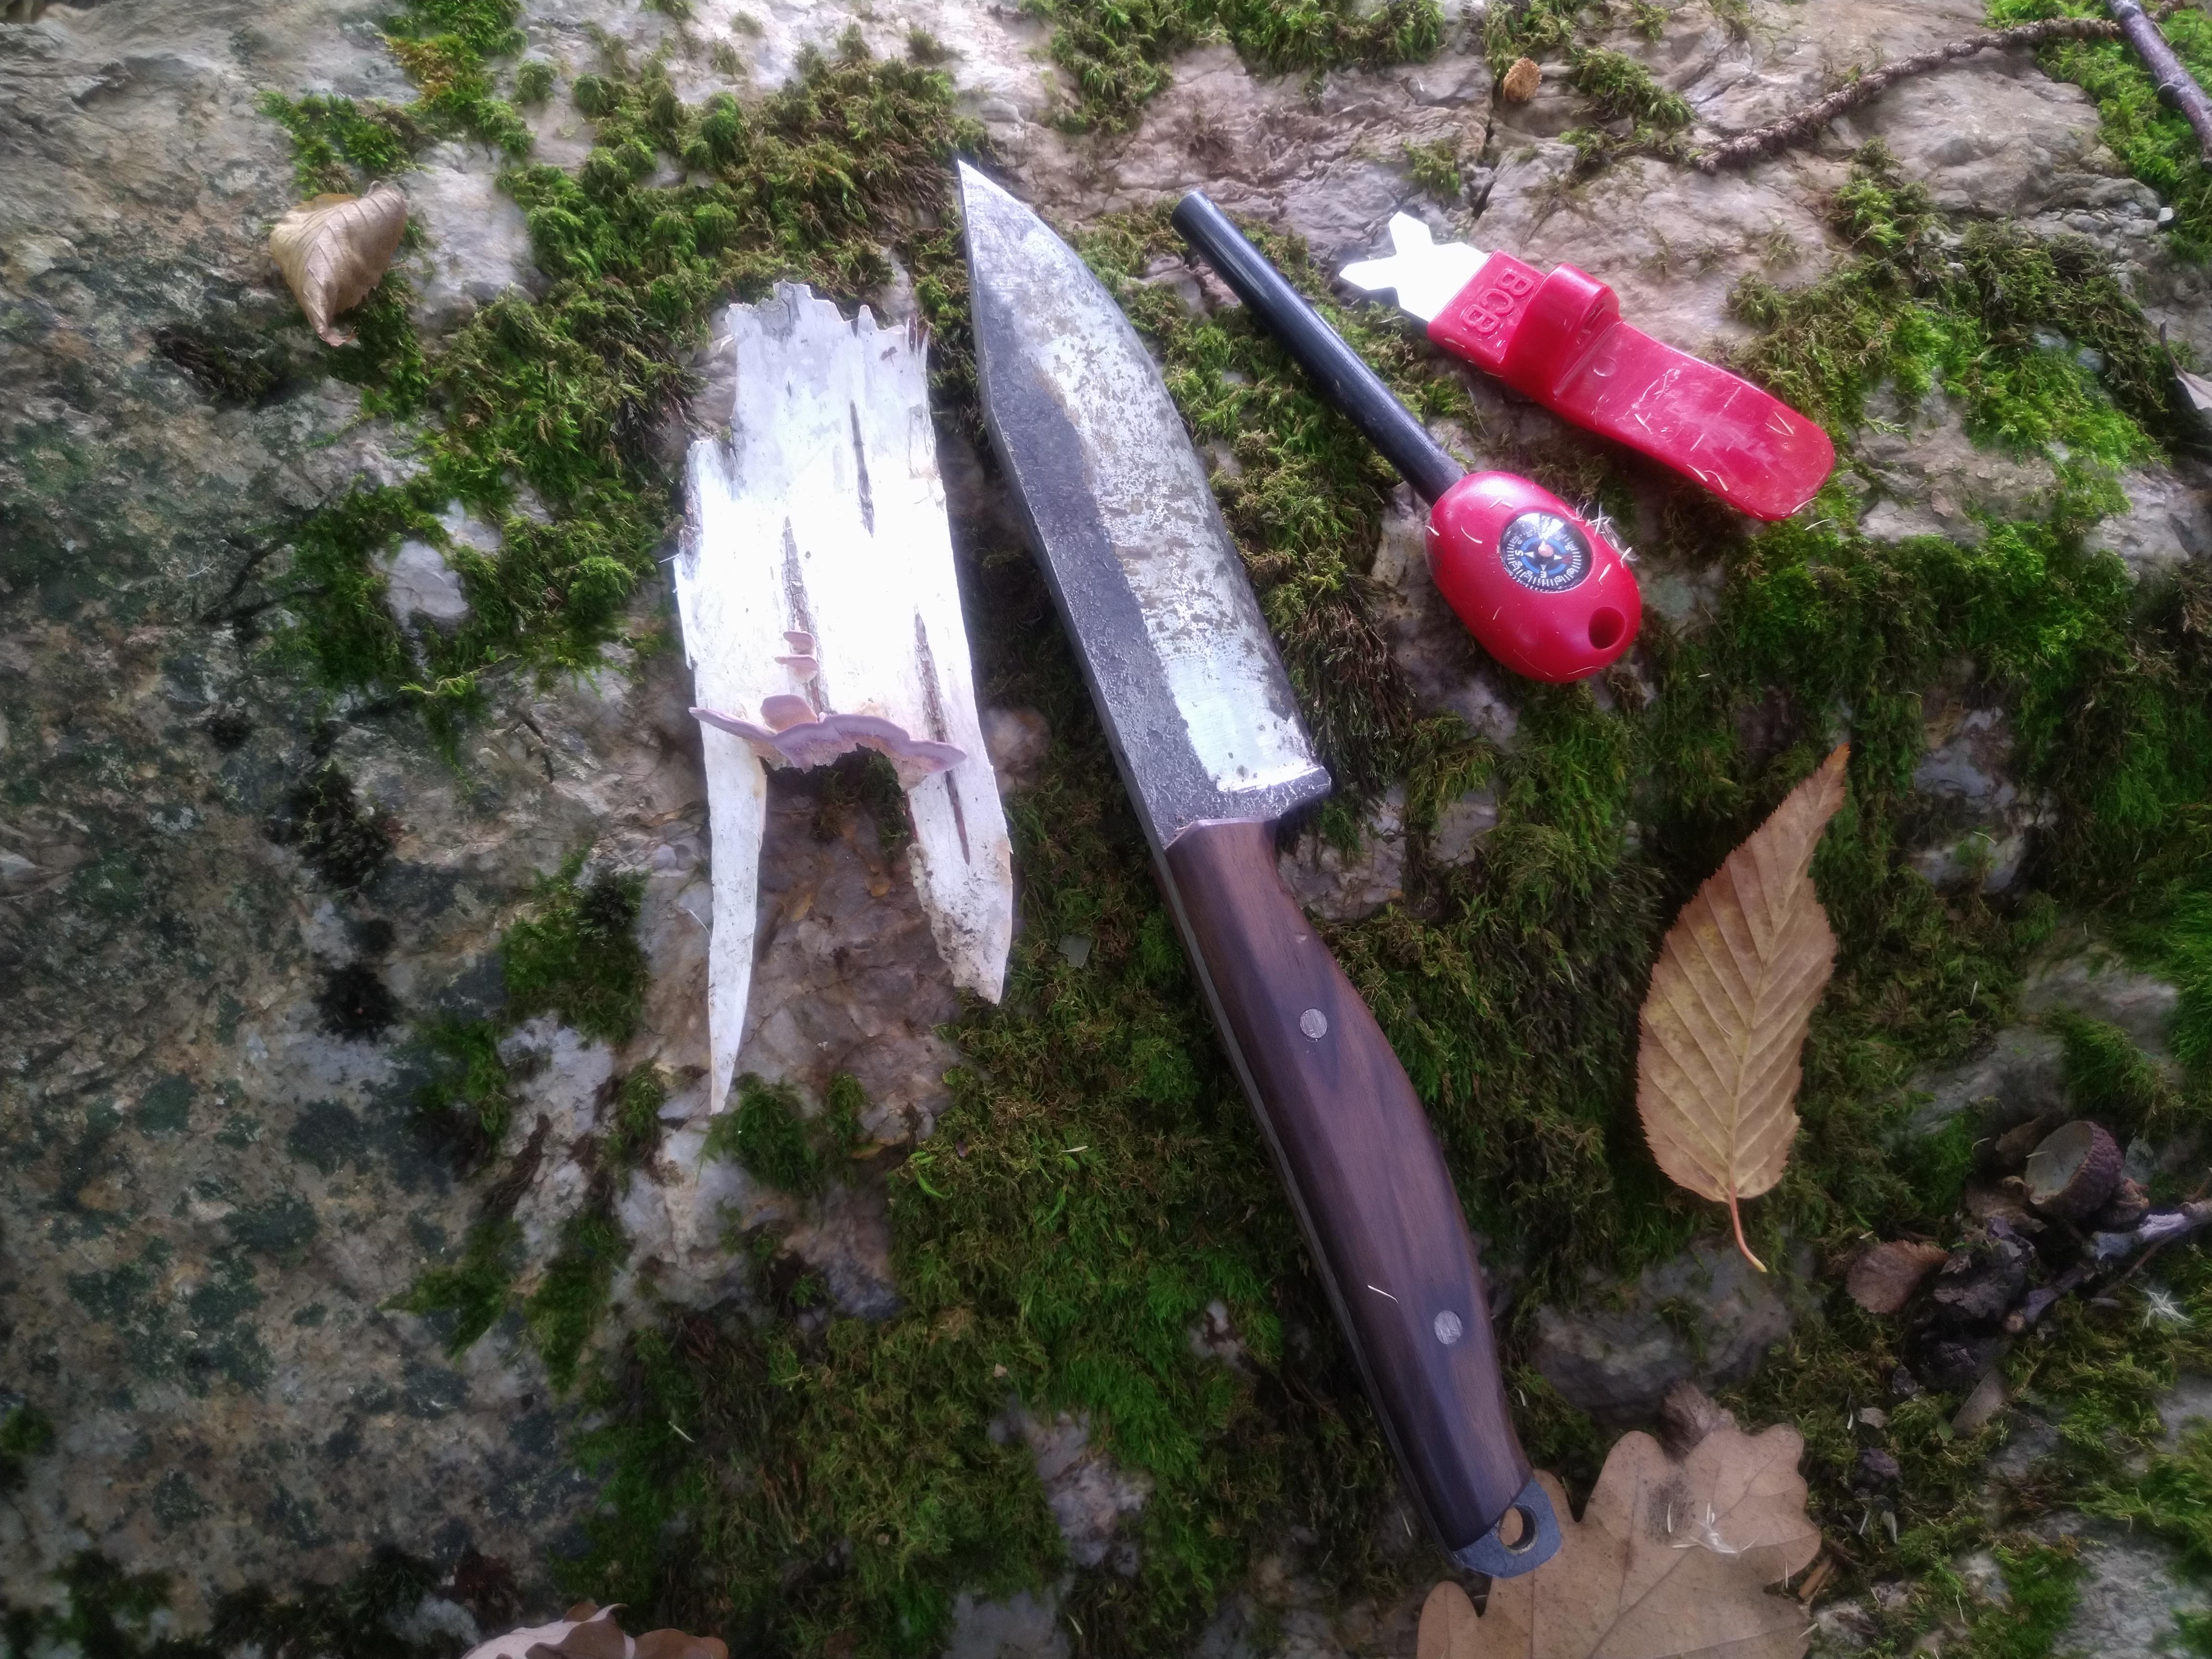 B33 army shop - ročno kovani noži, outdoor nož, vsestranski nož, bushcraft nož, trgovina z vojaško opremo, vojaška trgovina